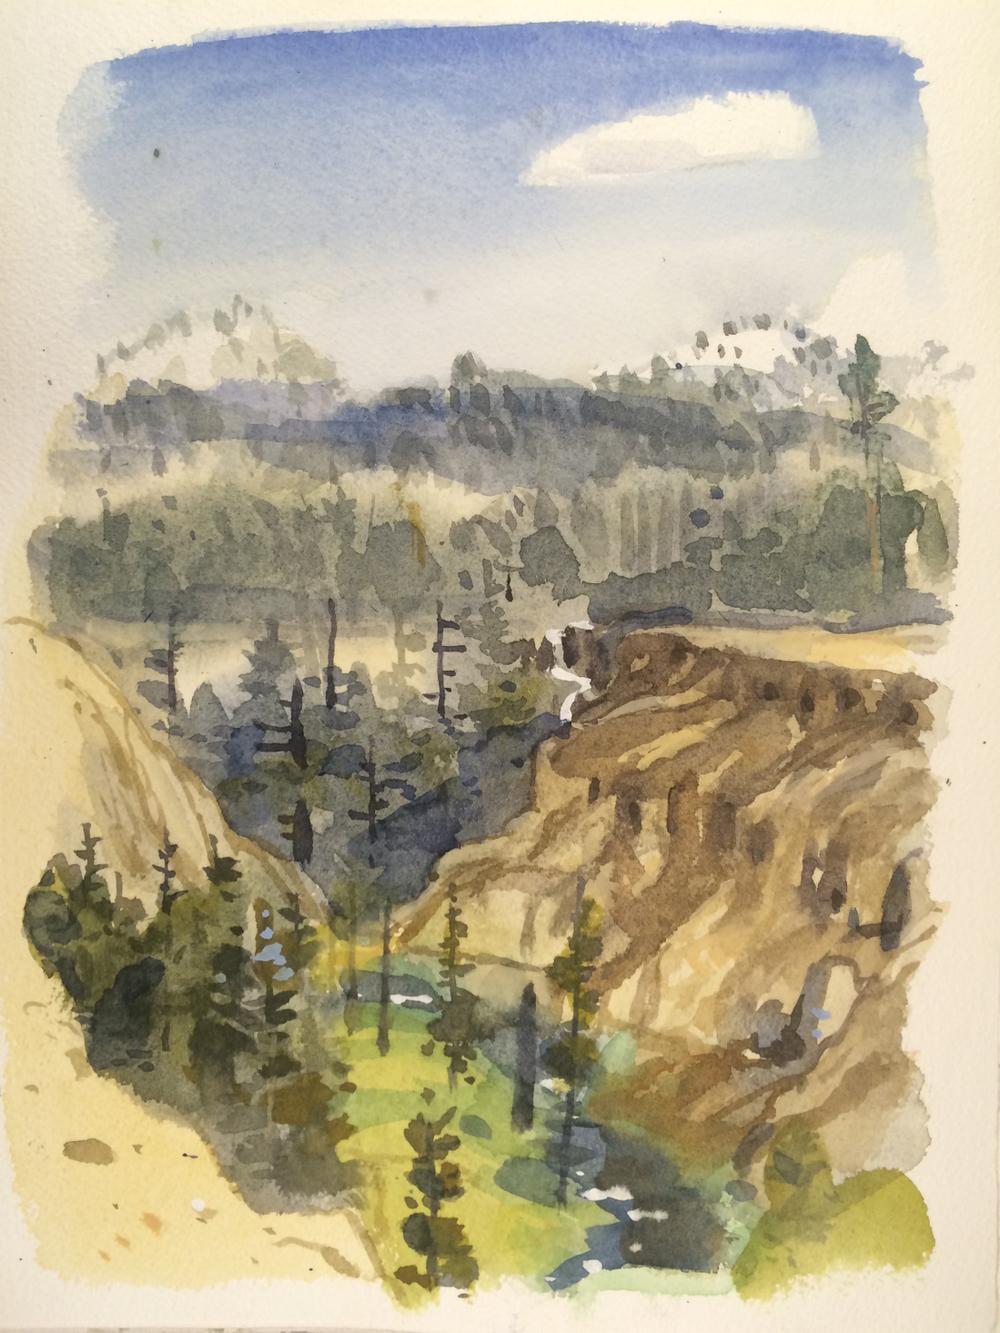 CLNP Annie's Creek (study)